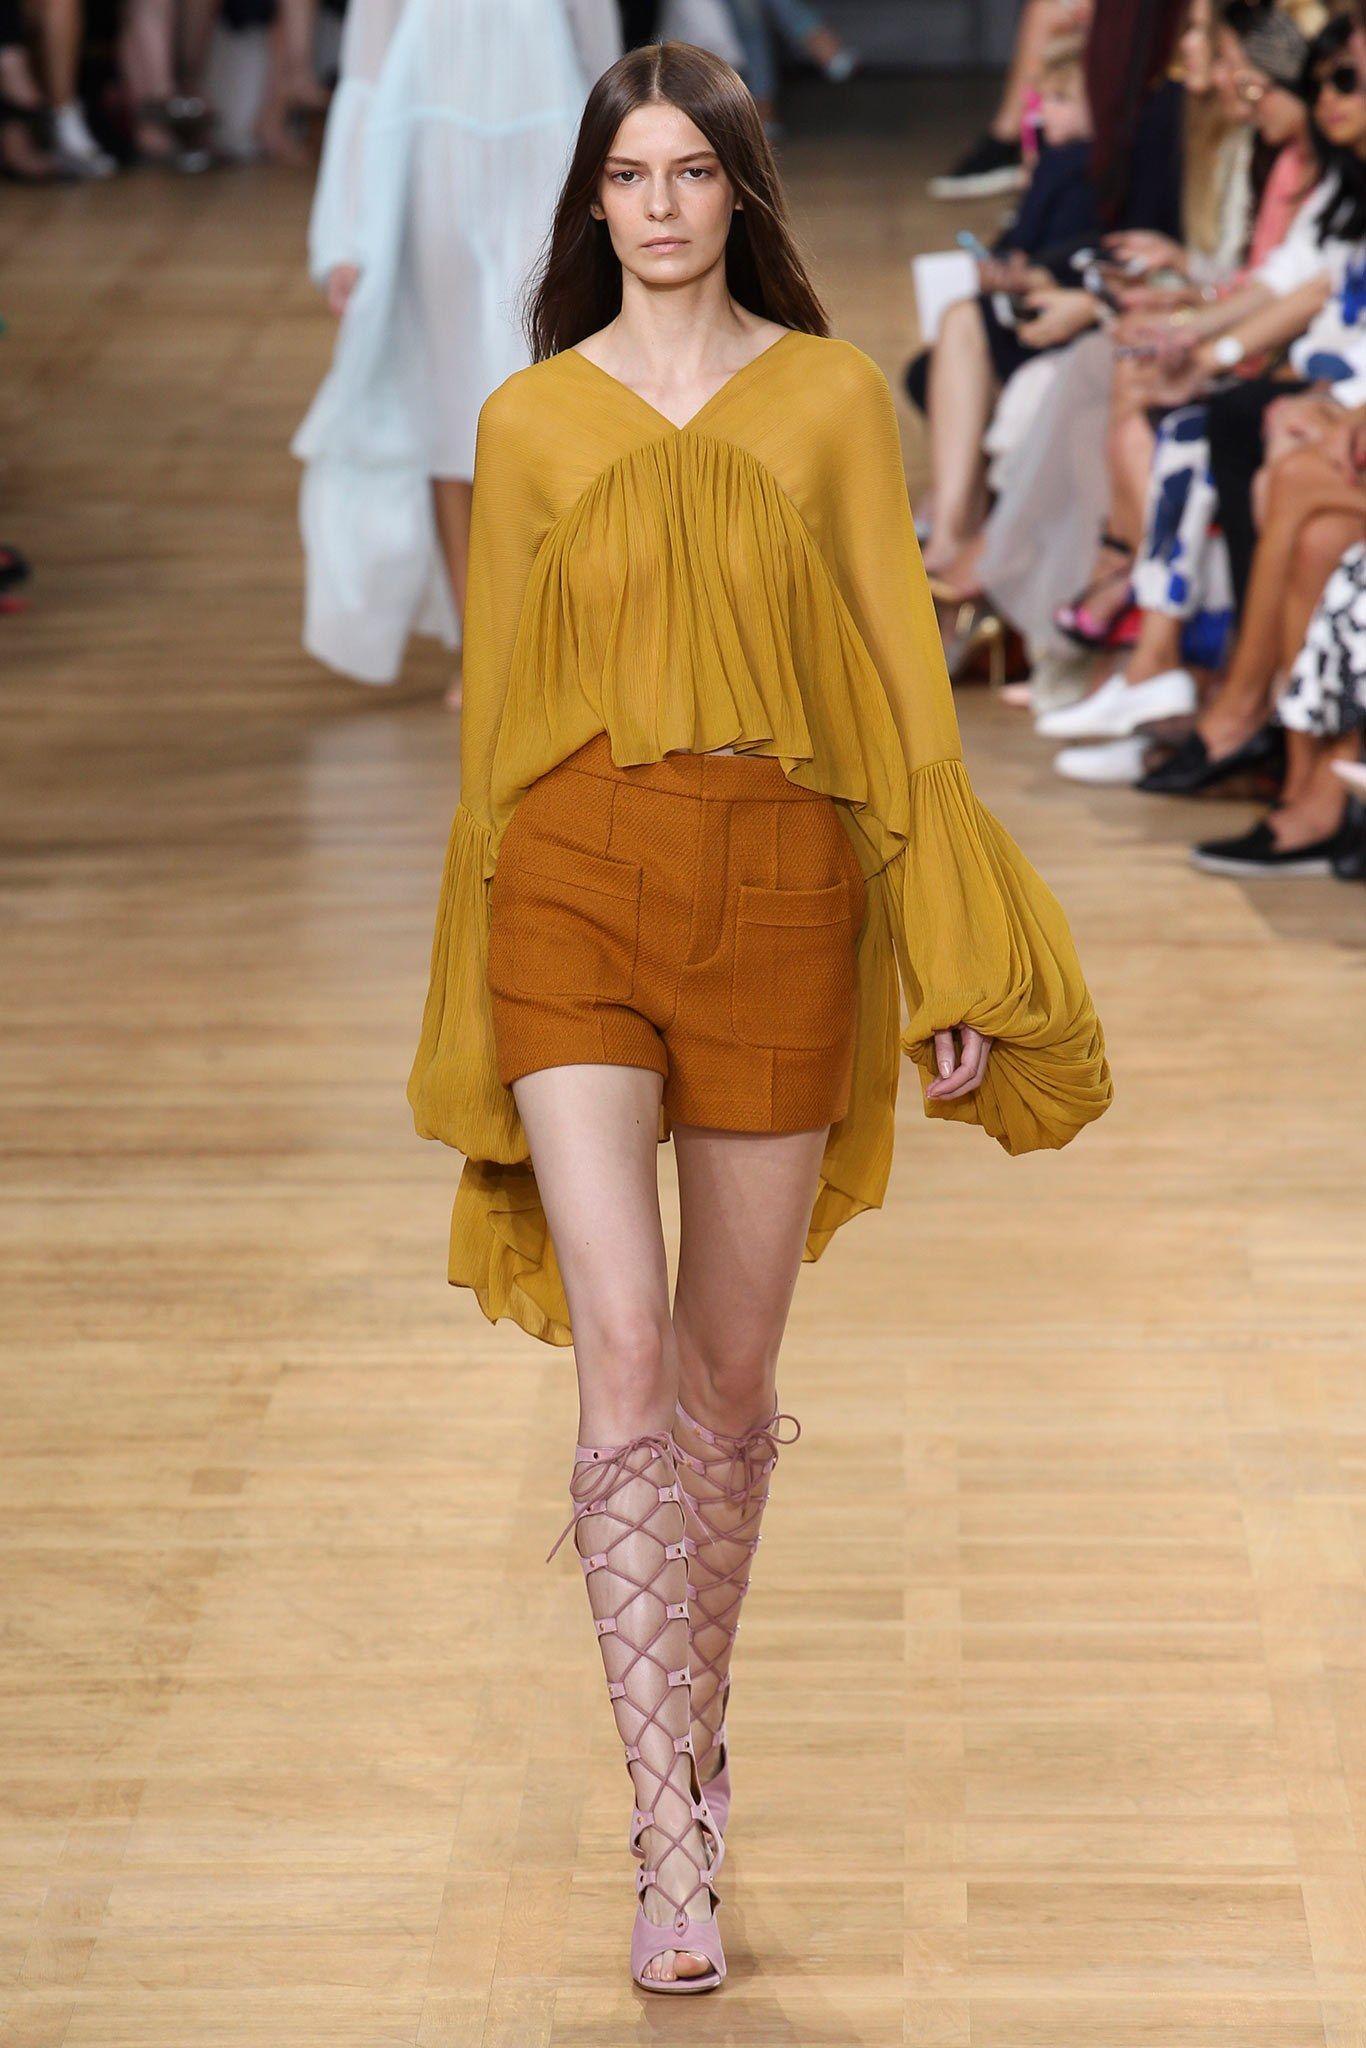 Chloé Spring 2015 Ready-to-Wear Fashion Show - Dasha Denisenko (Supreme)